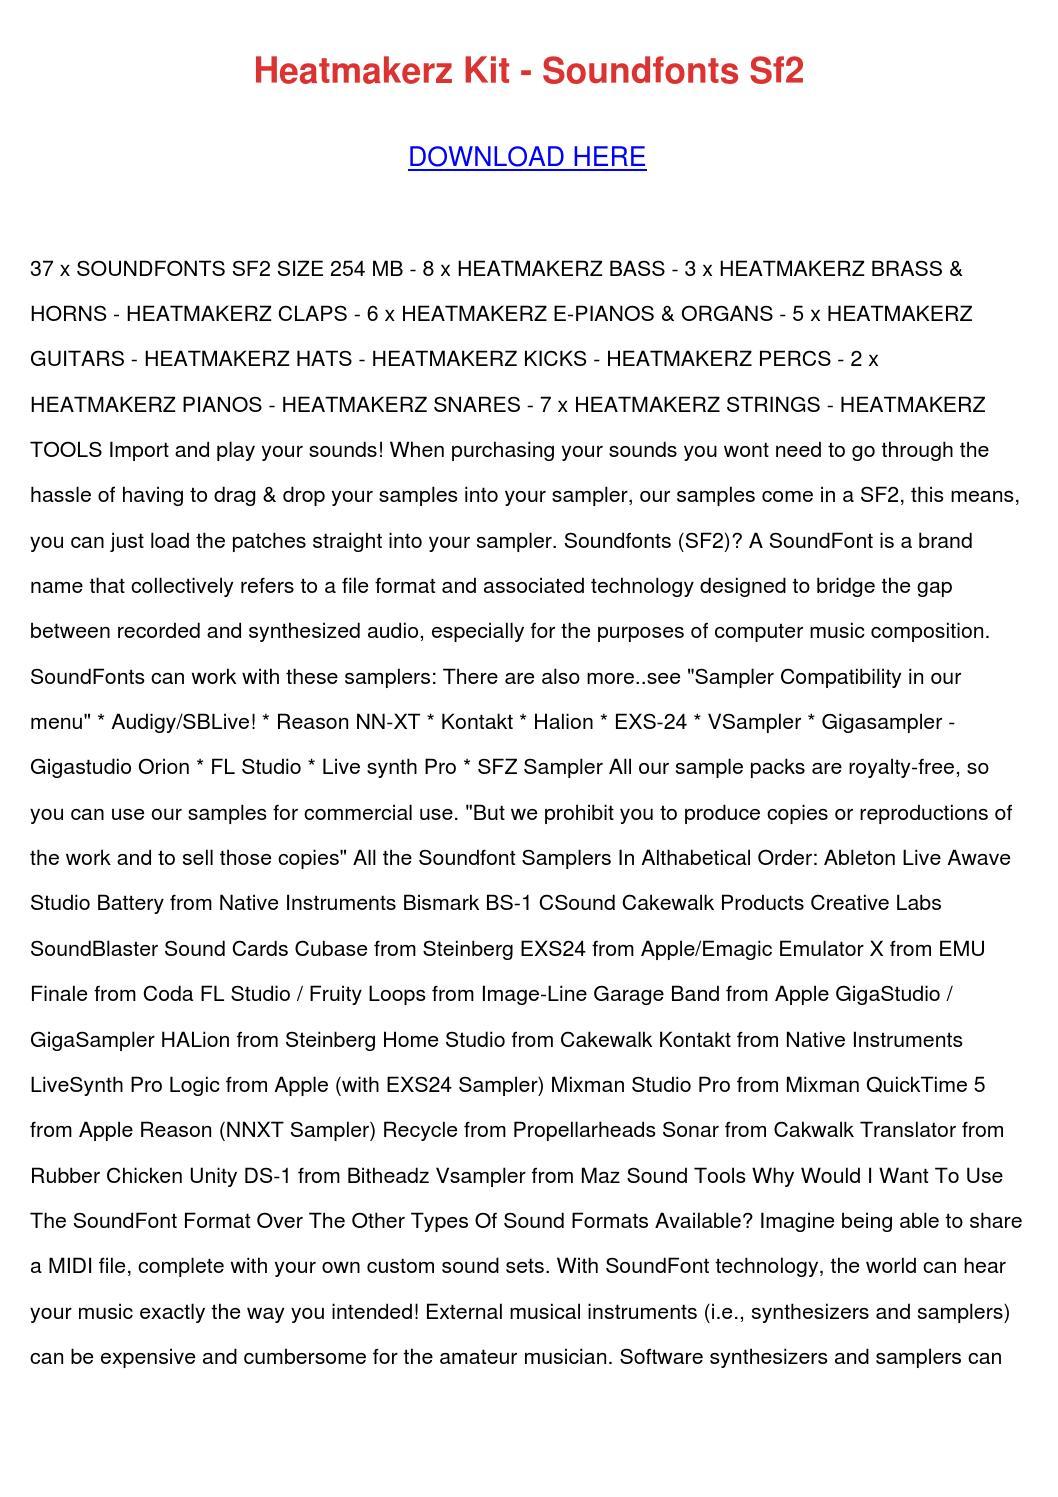 Heatmakerz Kit Soundfonts Sf2 by AlejandrinaWinfield - issuu